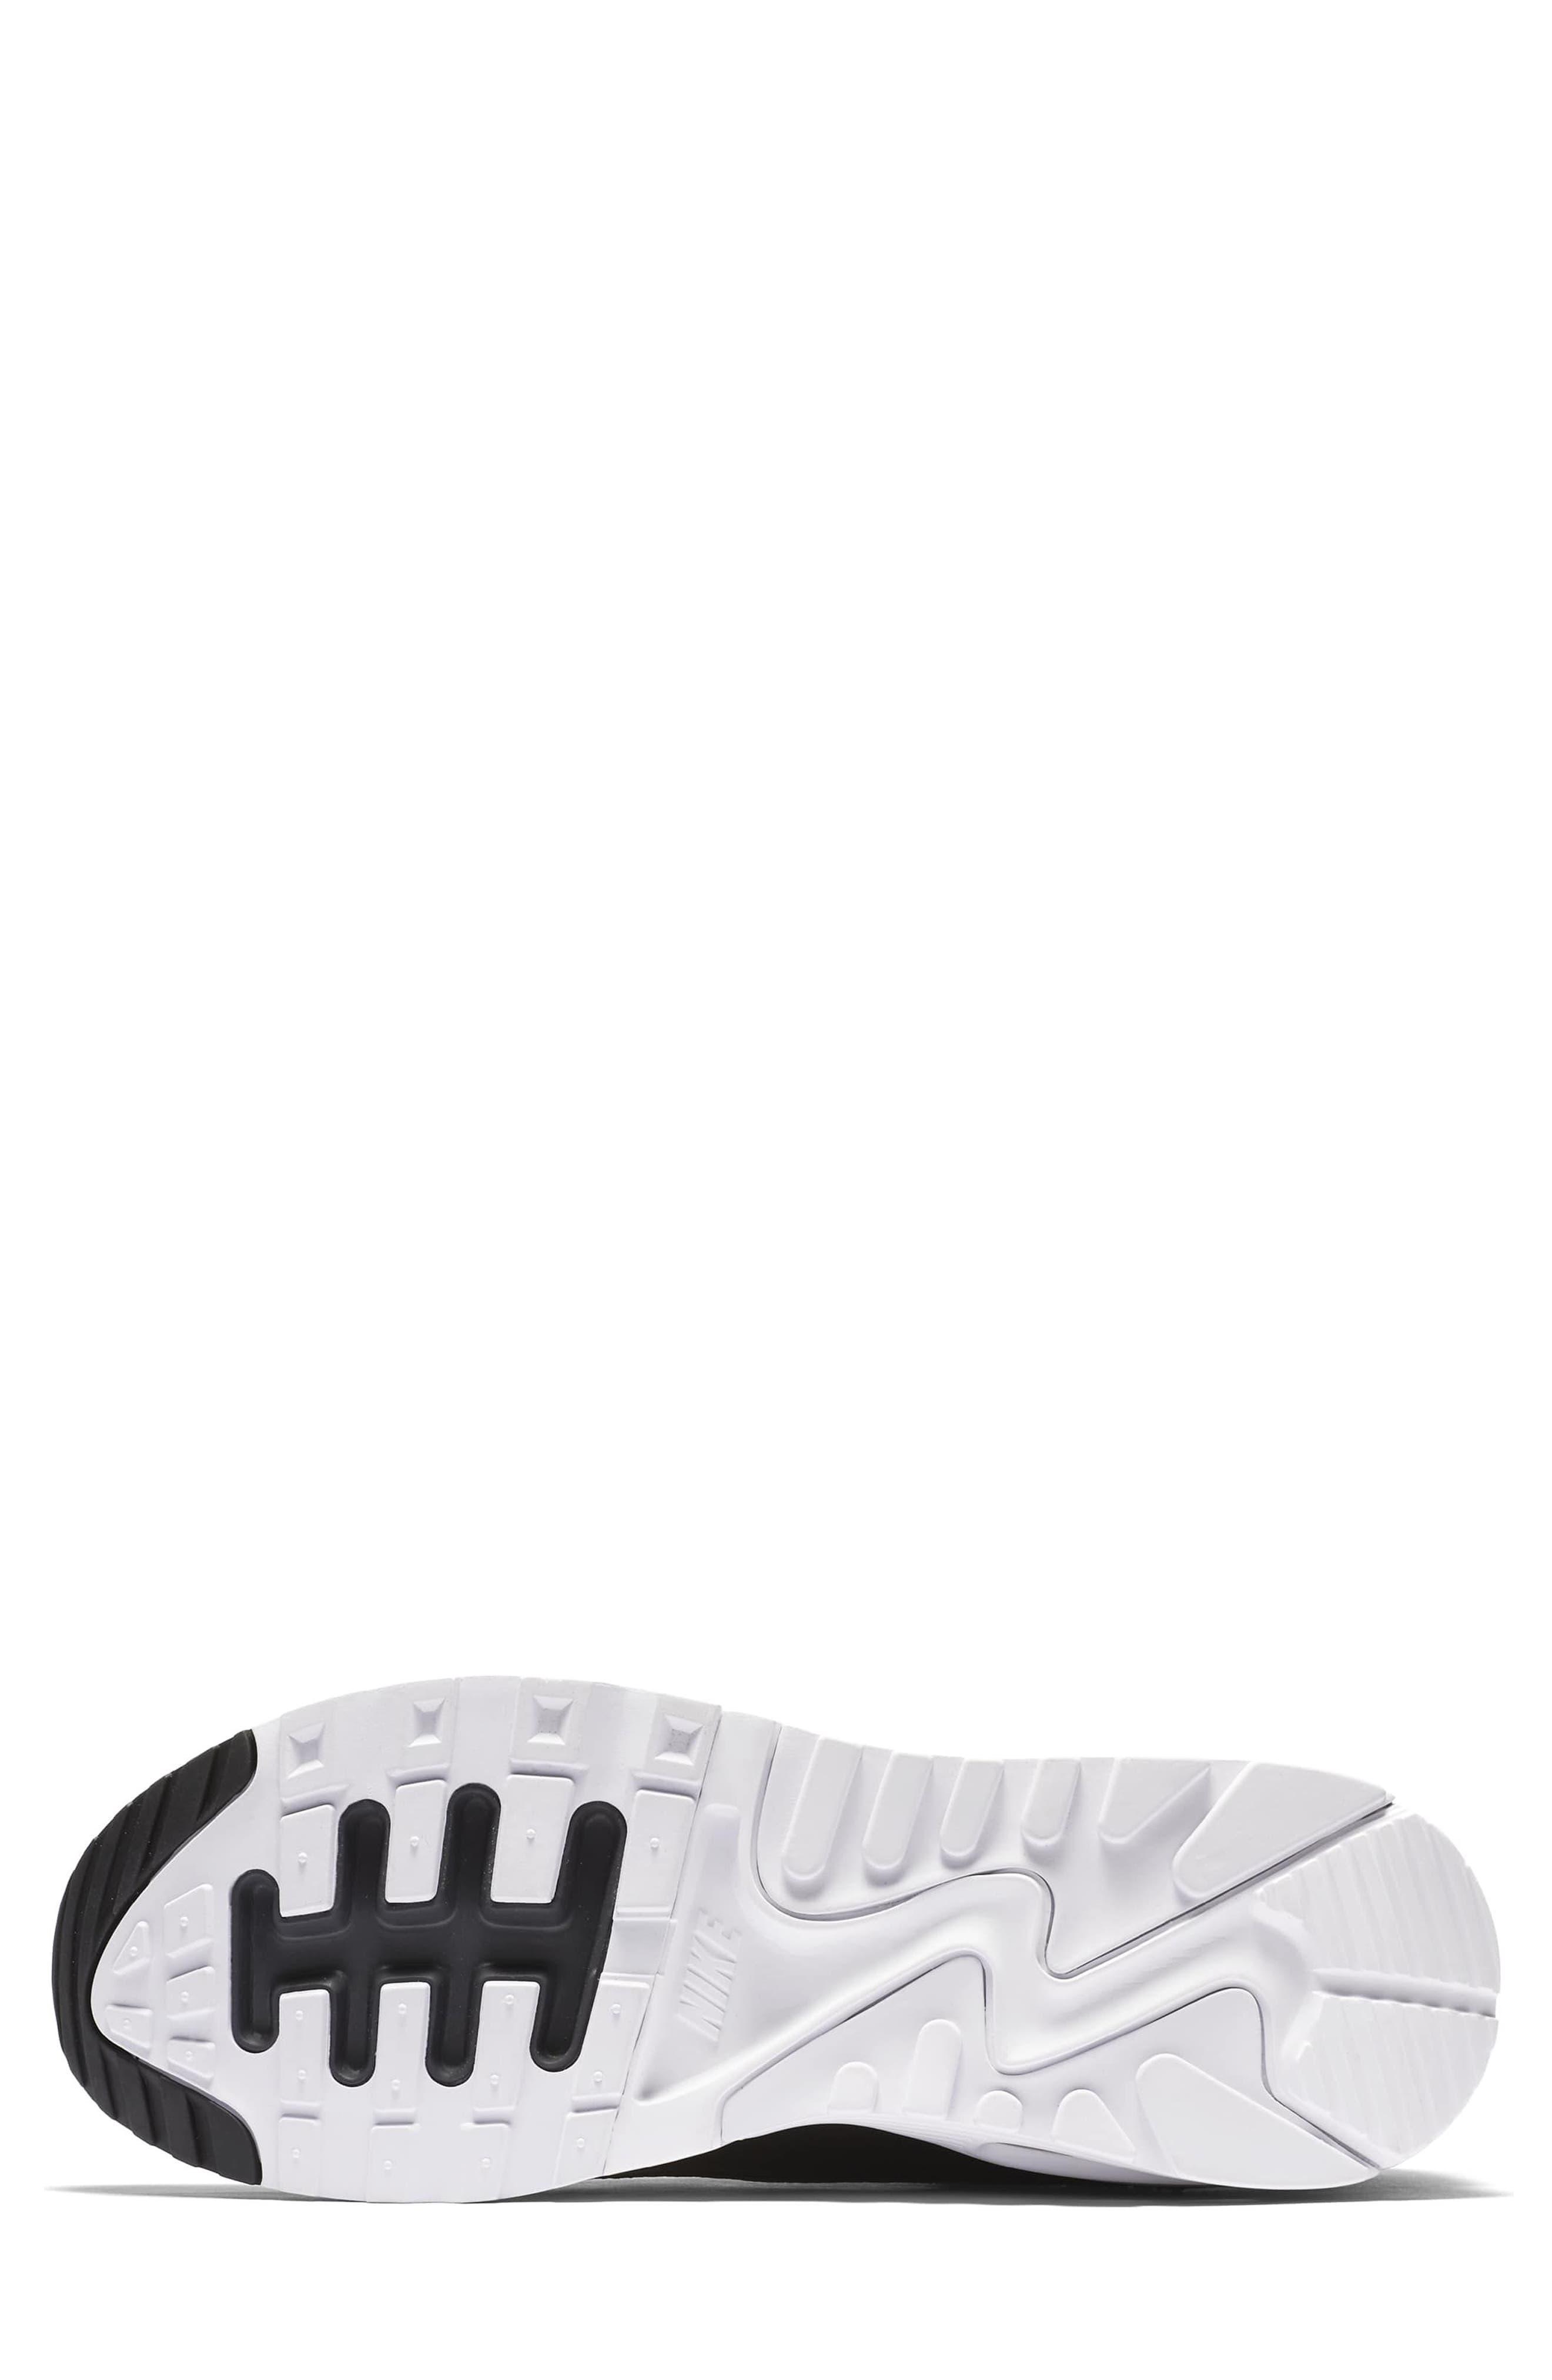 Air Max 90 Ultra 2.0 Sneaker,                             Alternate thumbnail 5, color,                             002